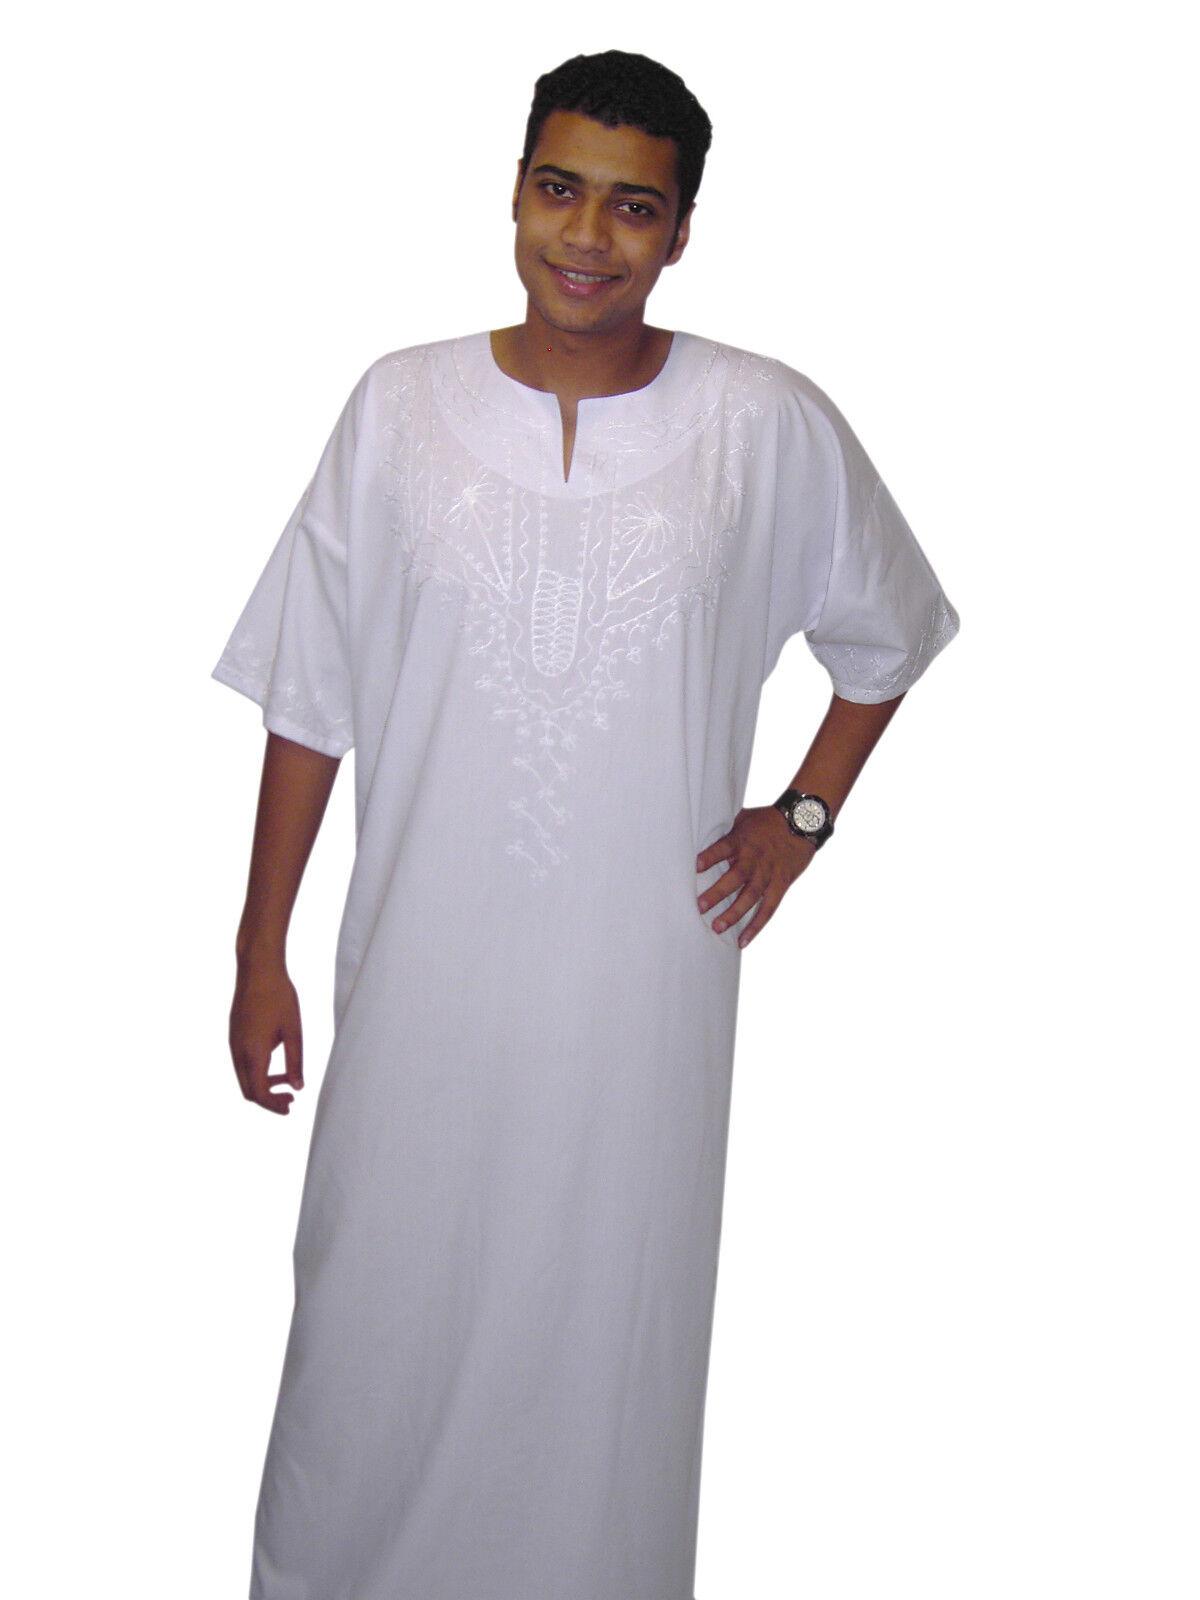 Modern Men's Caftan Housecoat Aus1001 Night in White - Kam00535